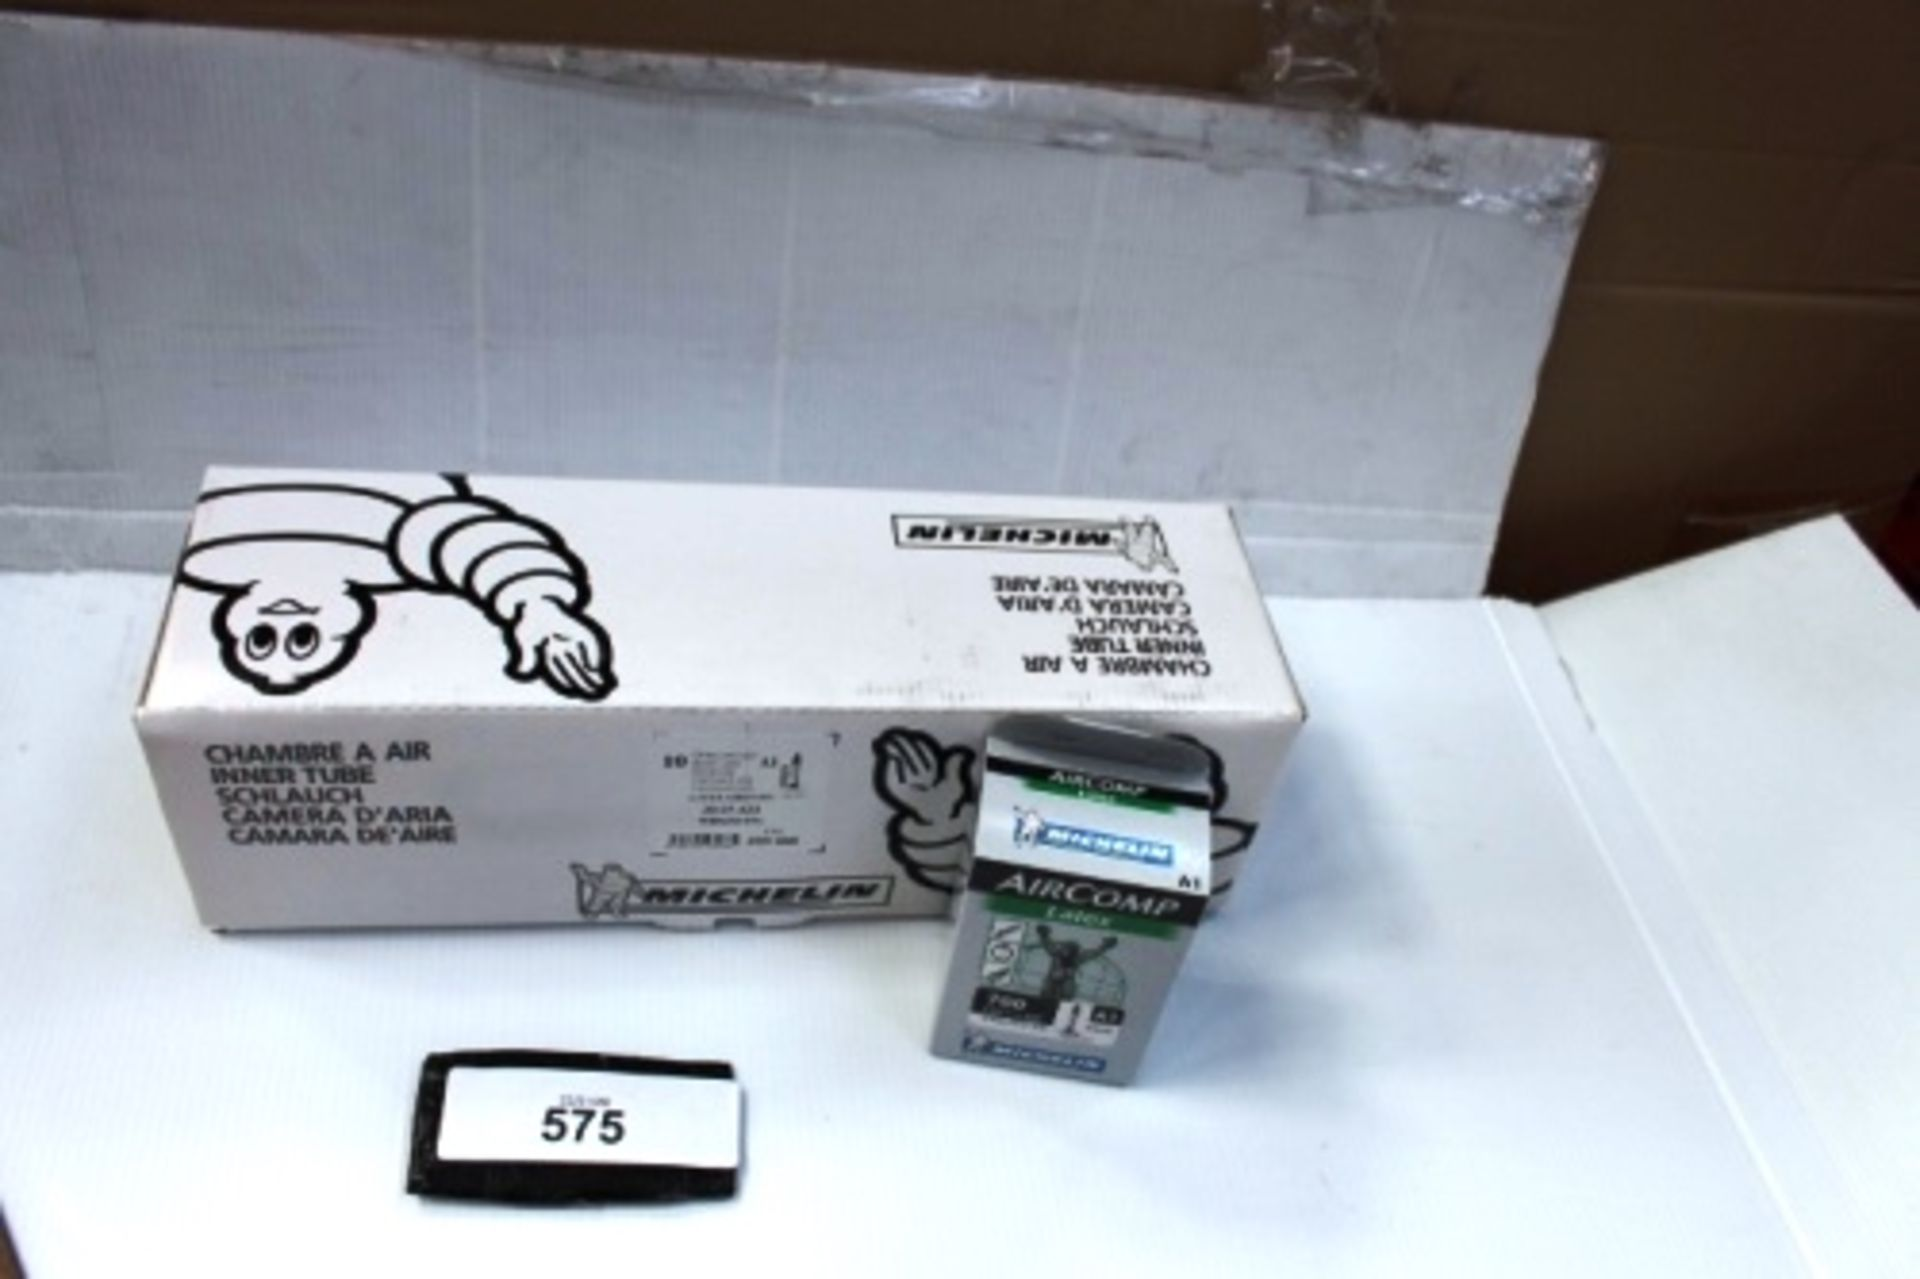 Lot 575 - 10 x Michelin Air Comp Latex 60mm 700 x 22/23C inner tubes - New in box (ES13)